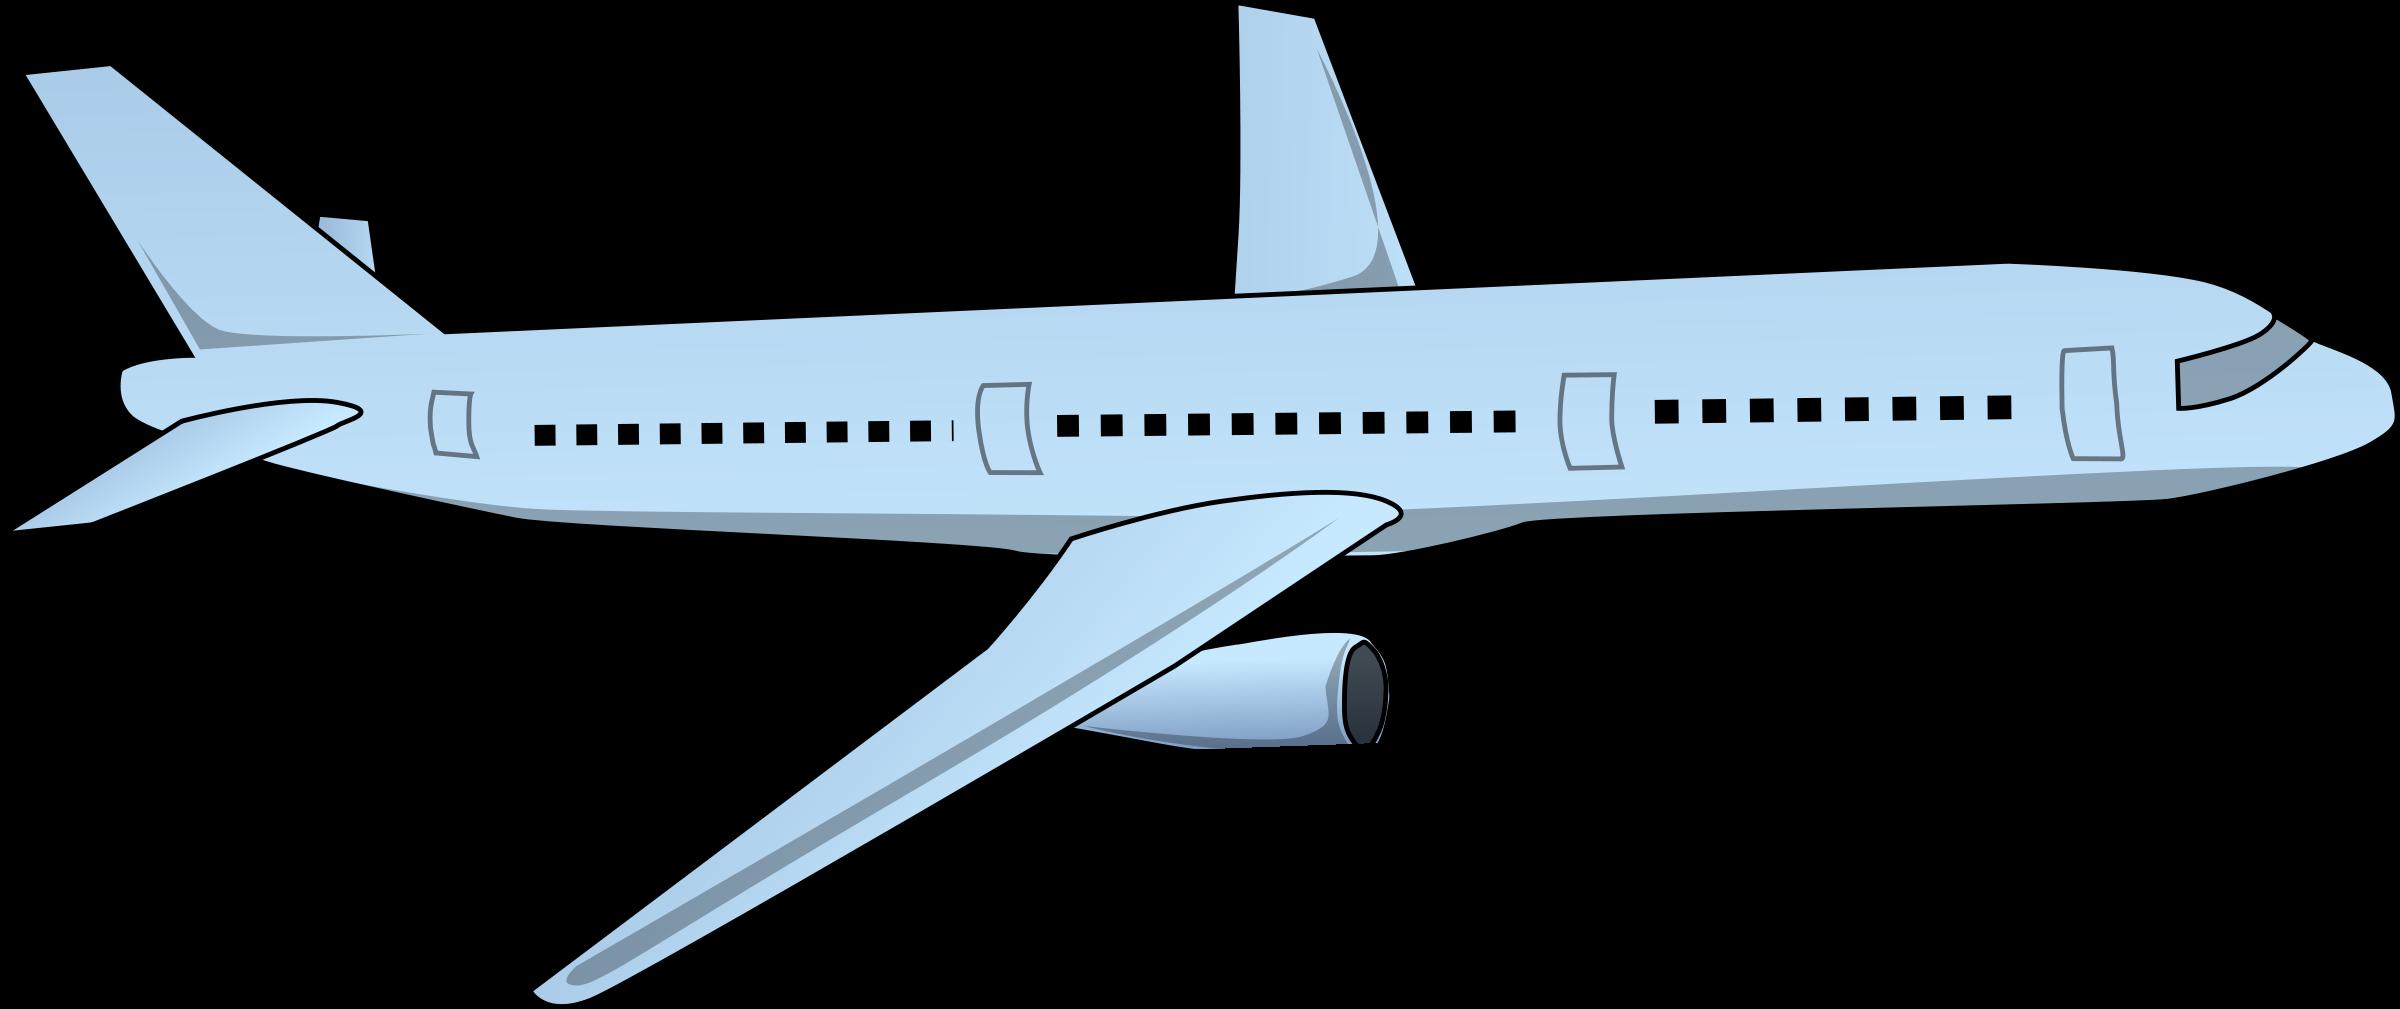 Airplane sketch acur lunamedia. Clipart plane easy